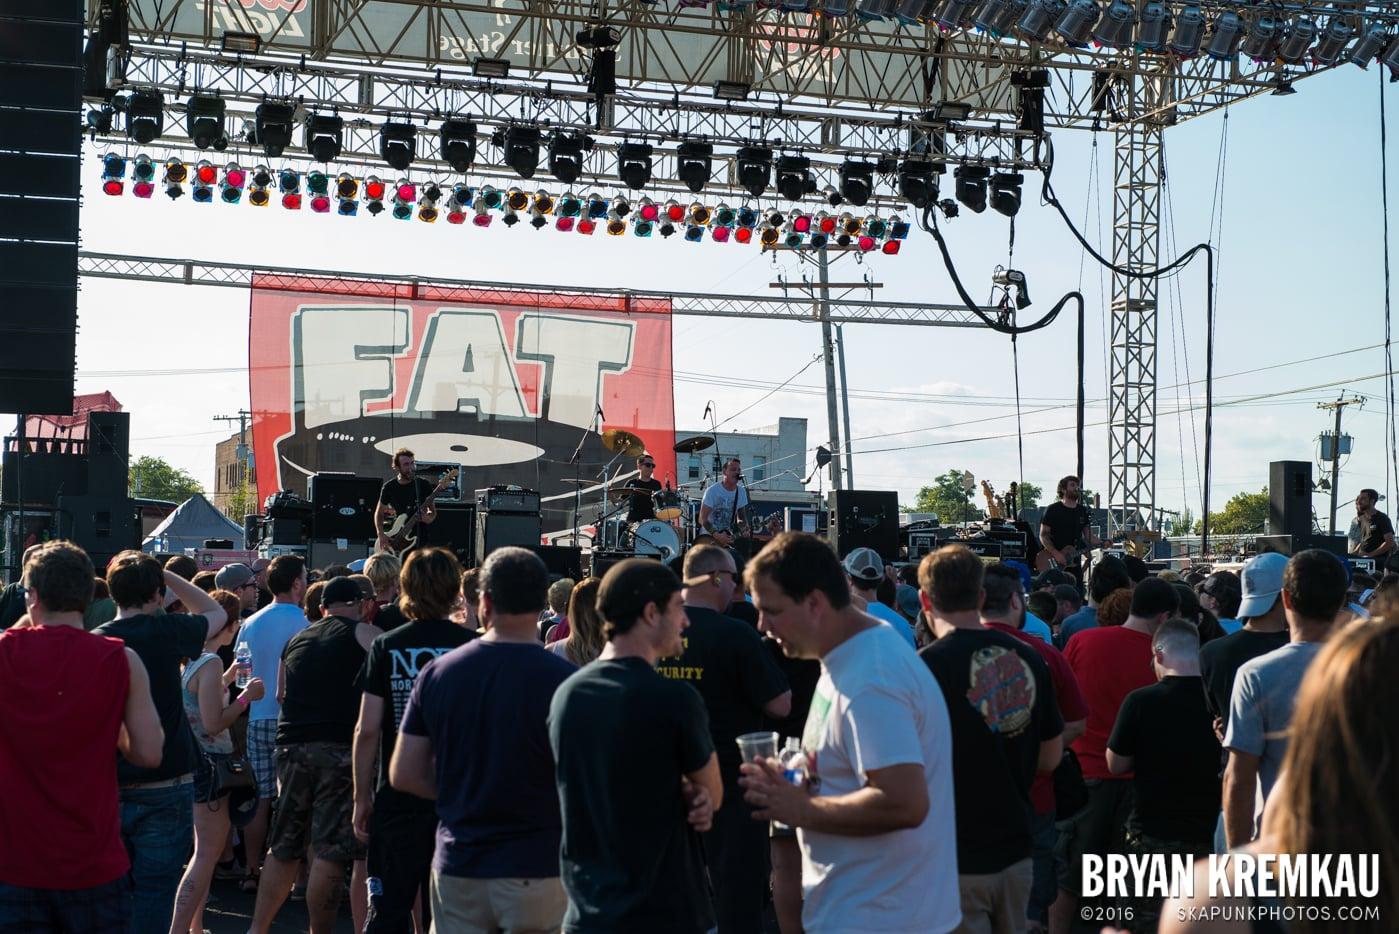 The Flatliners @ Stone Pony Summer Stage, Asbury Park, NJ - 8.15.15 (1)